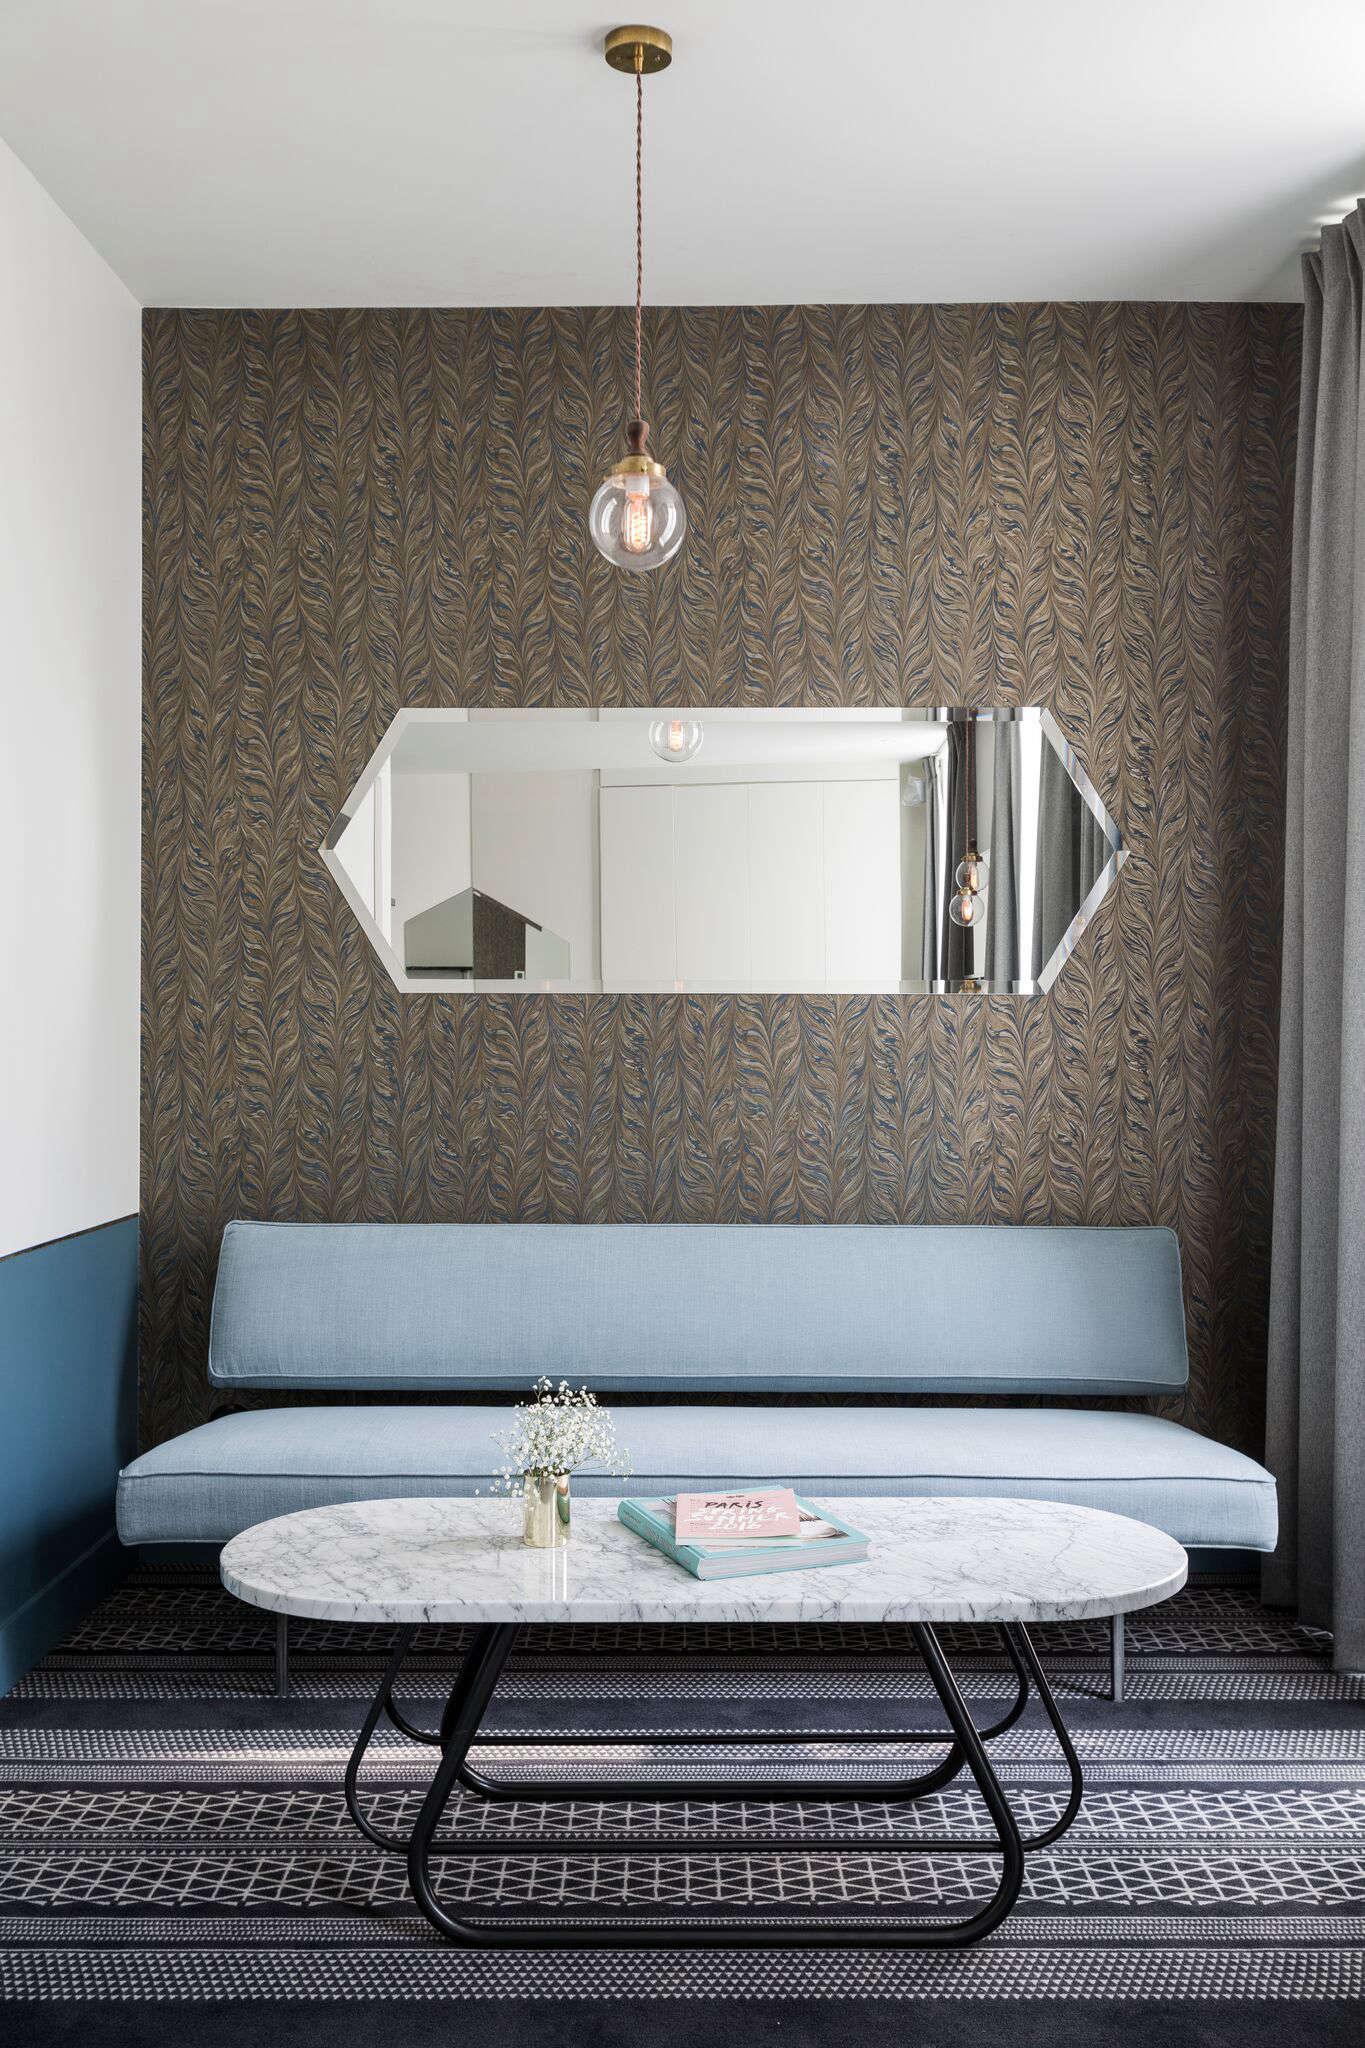 Hotel Panache An Affordable Design Hotel In Paris